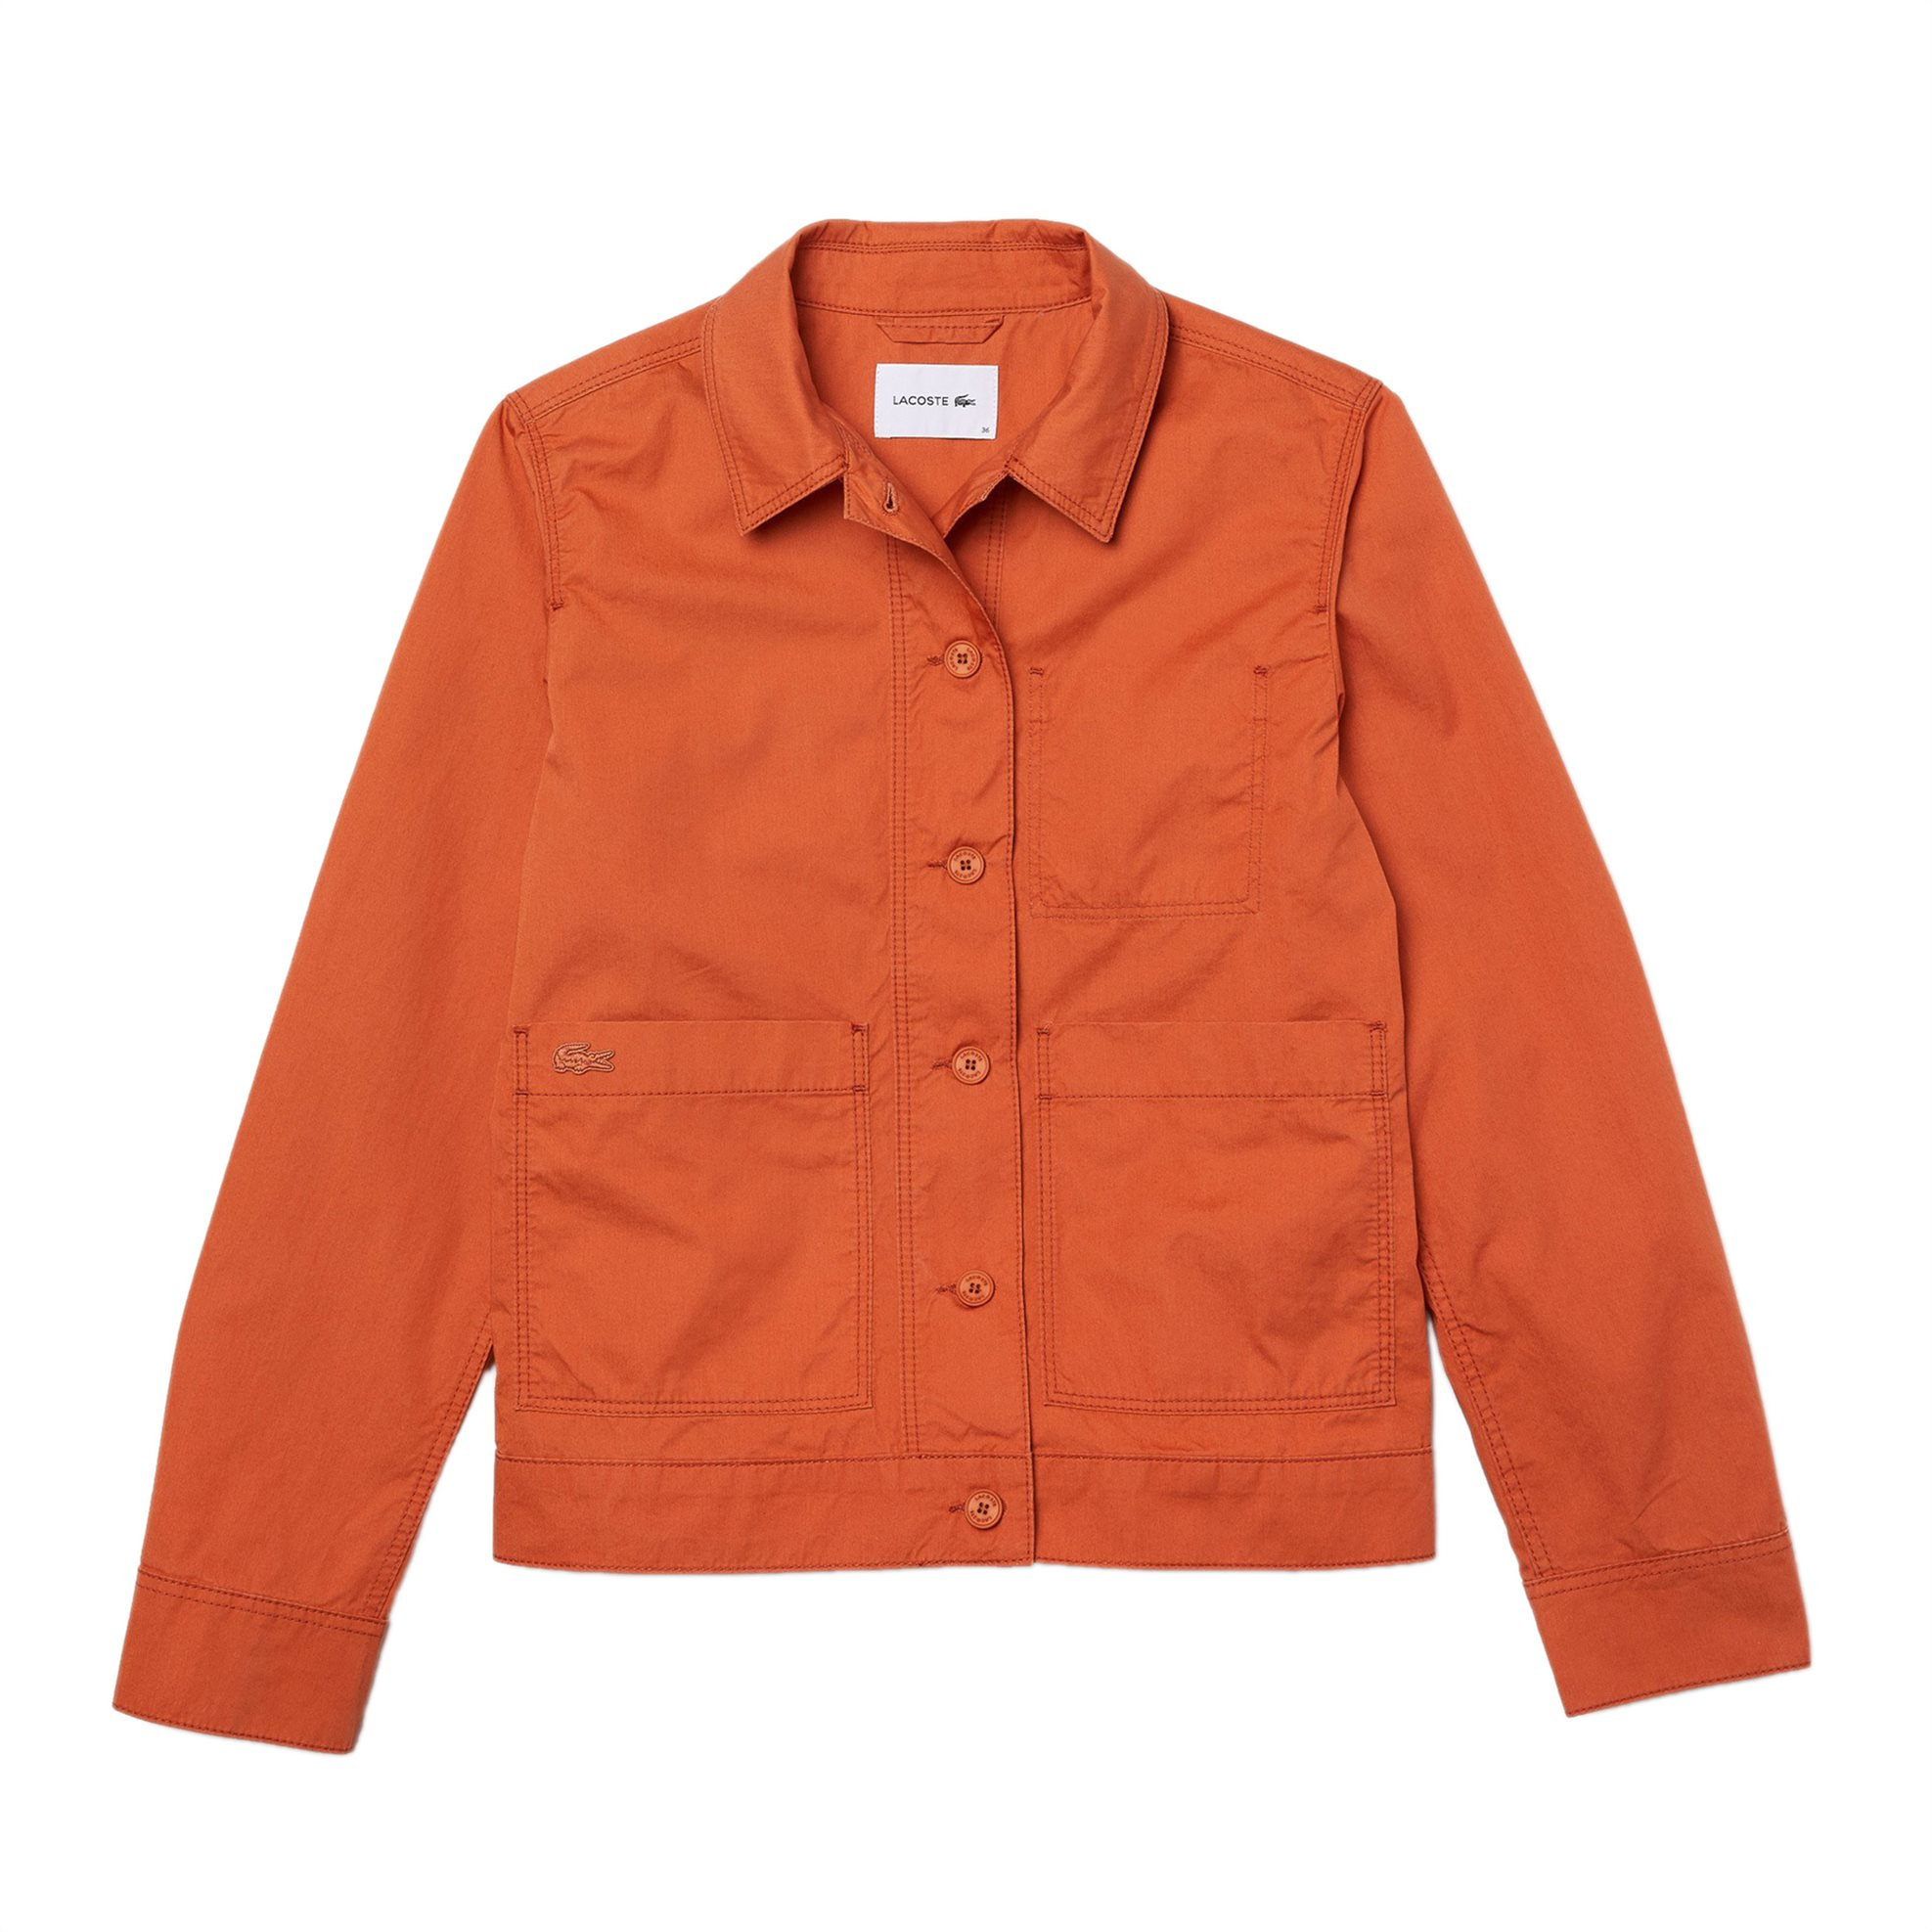 Lacoste γυναικείο jacket με κουμπιά - BF0231 - Πορτοκαλί